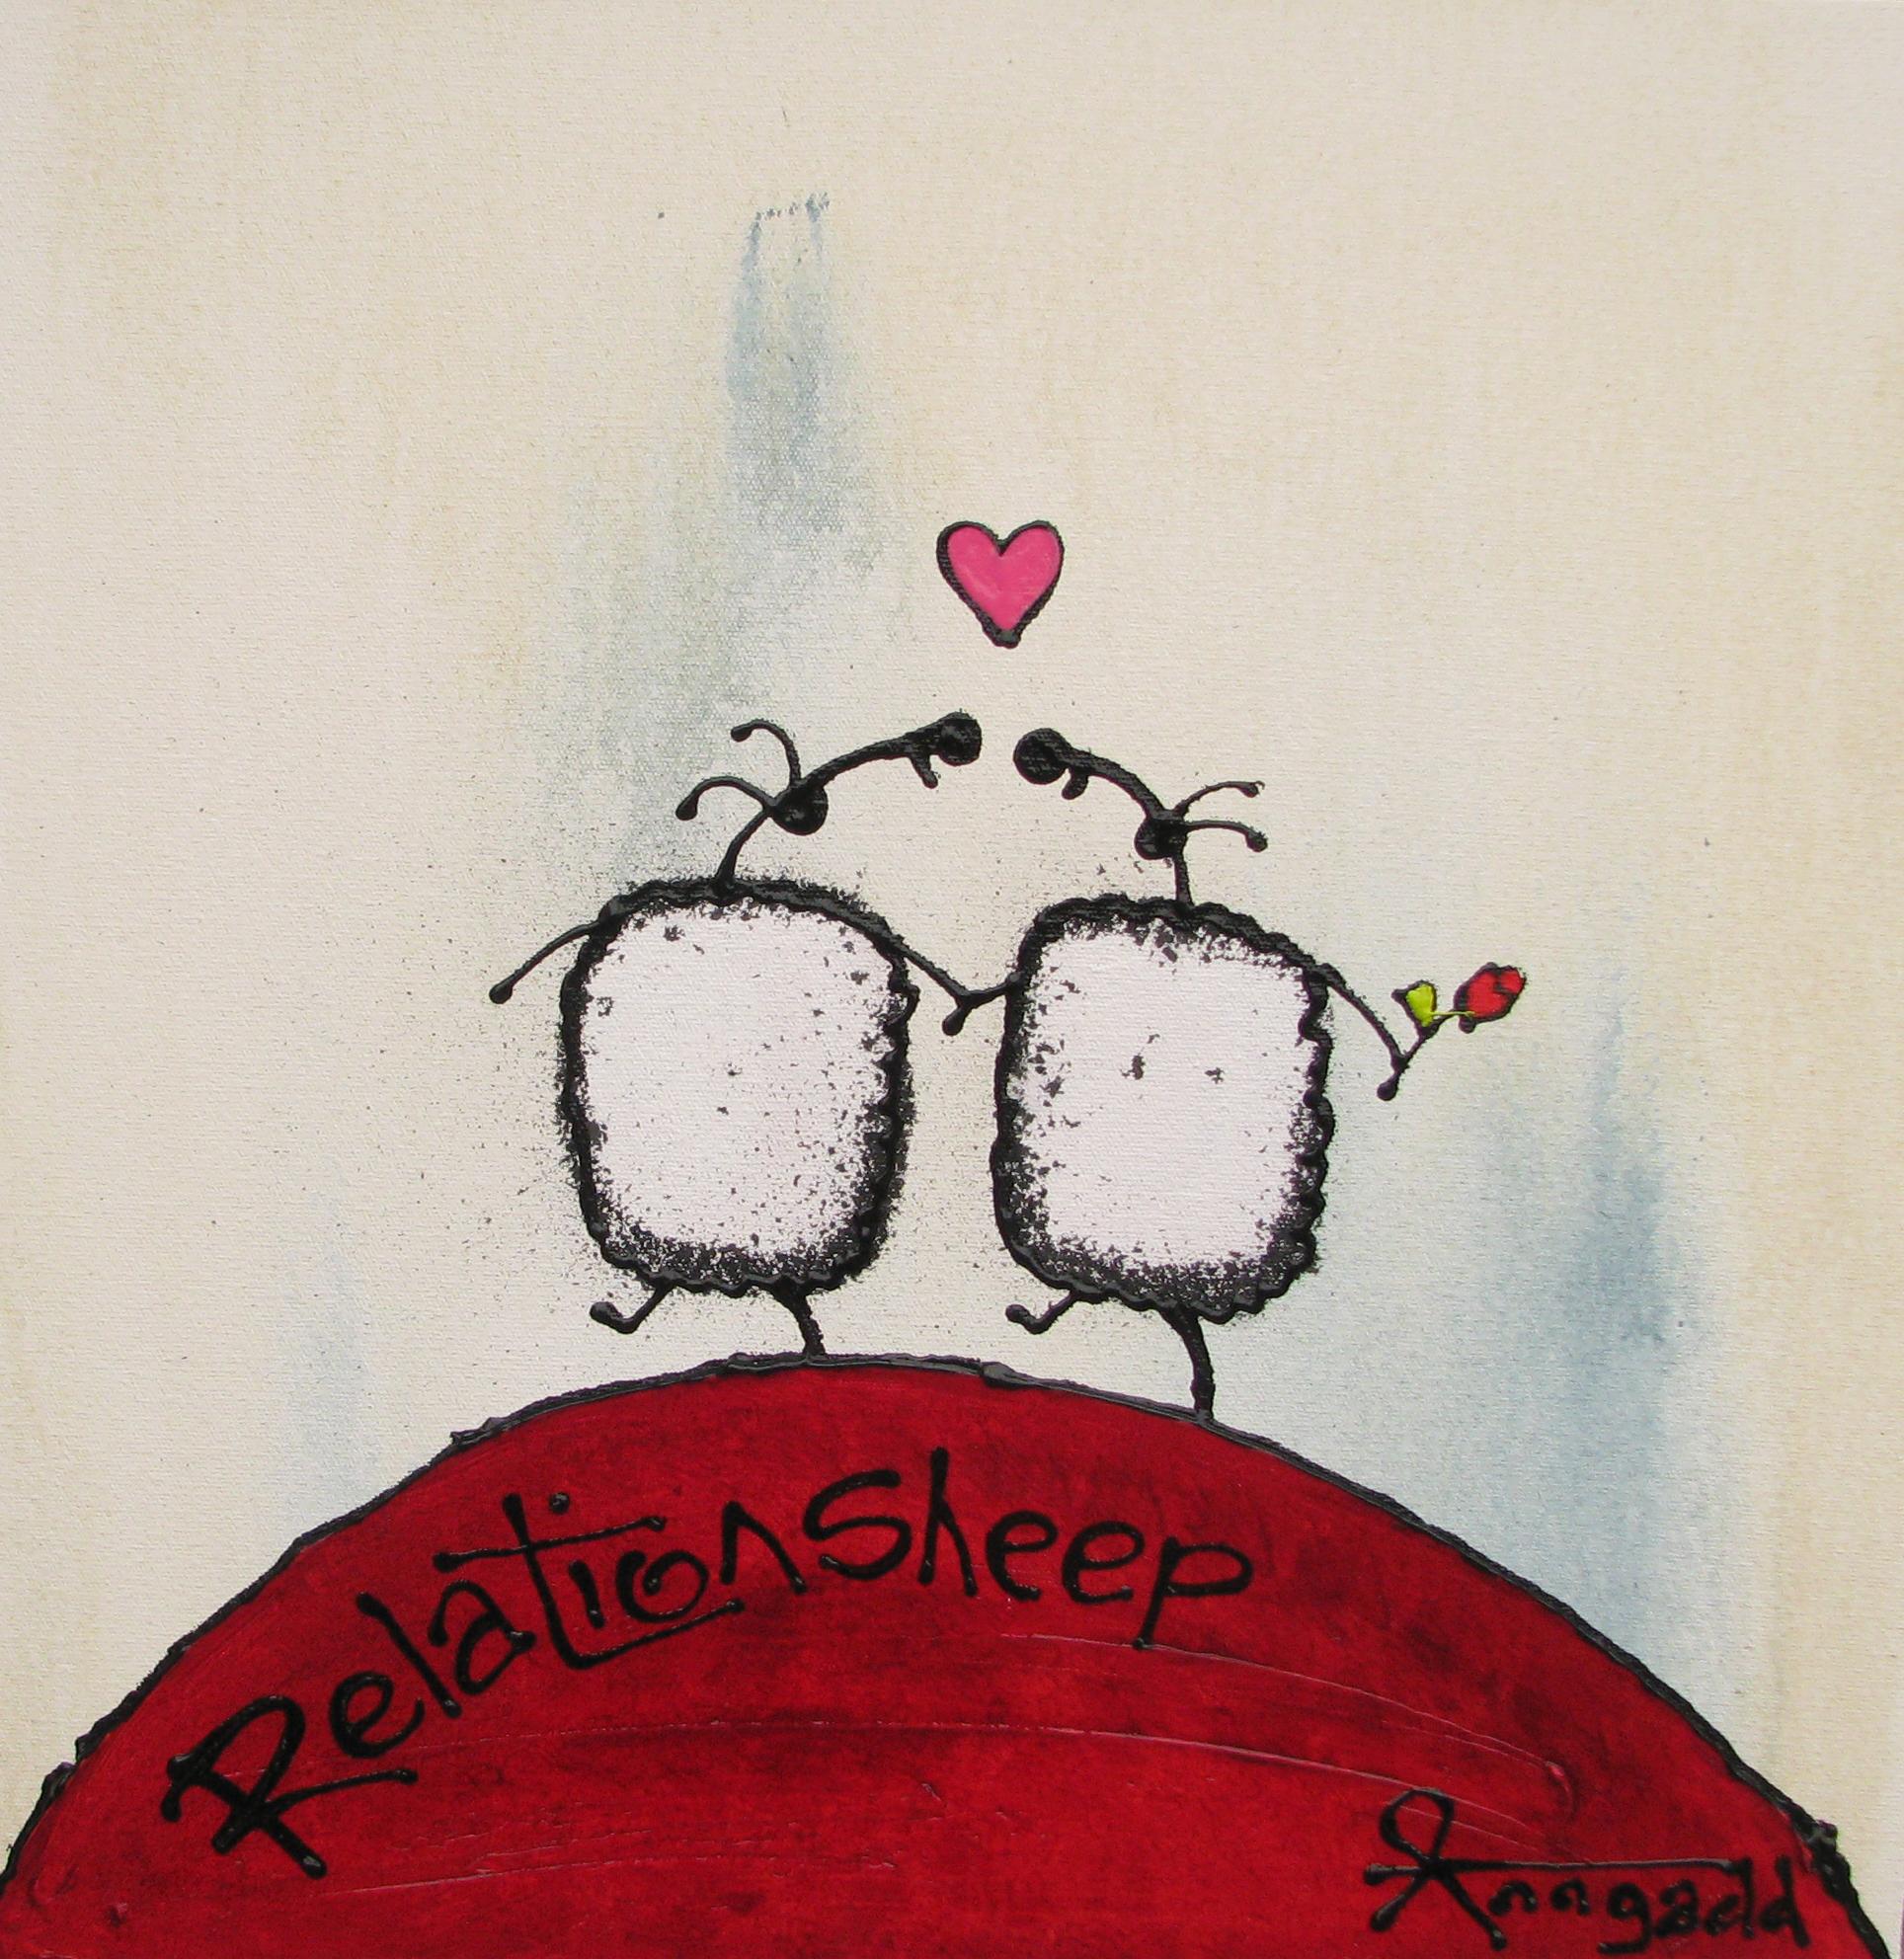 Relationsheep by Ann Gadd